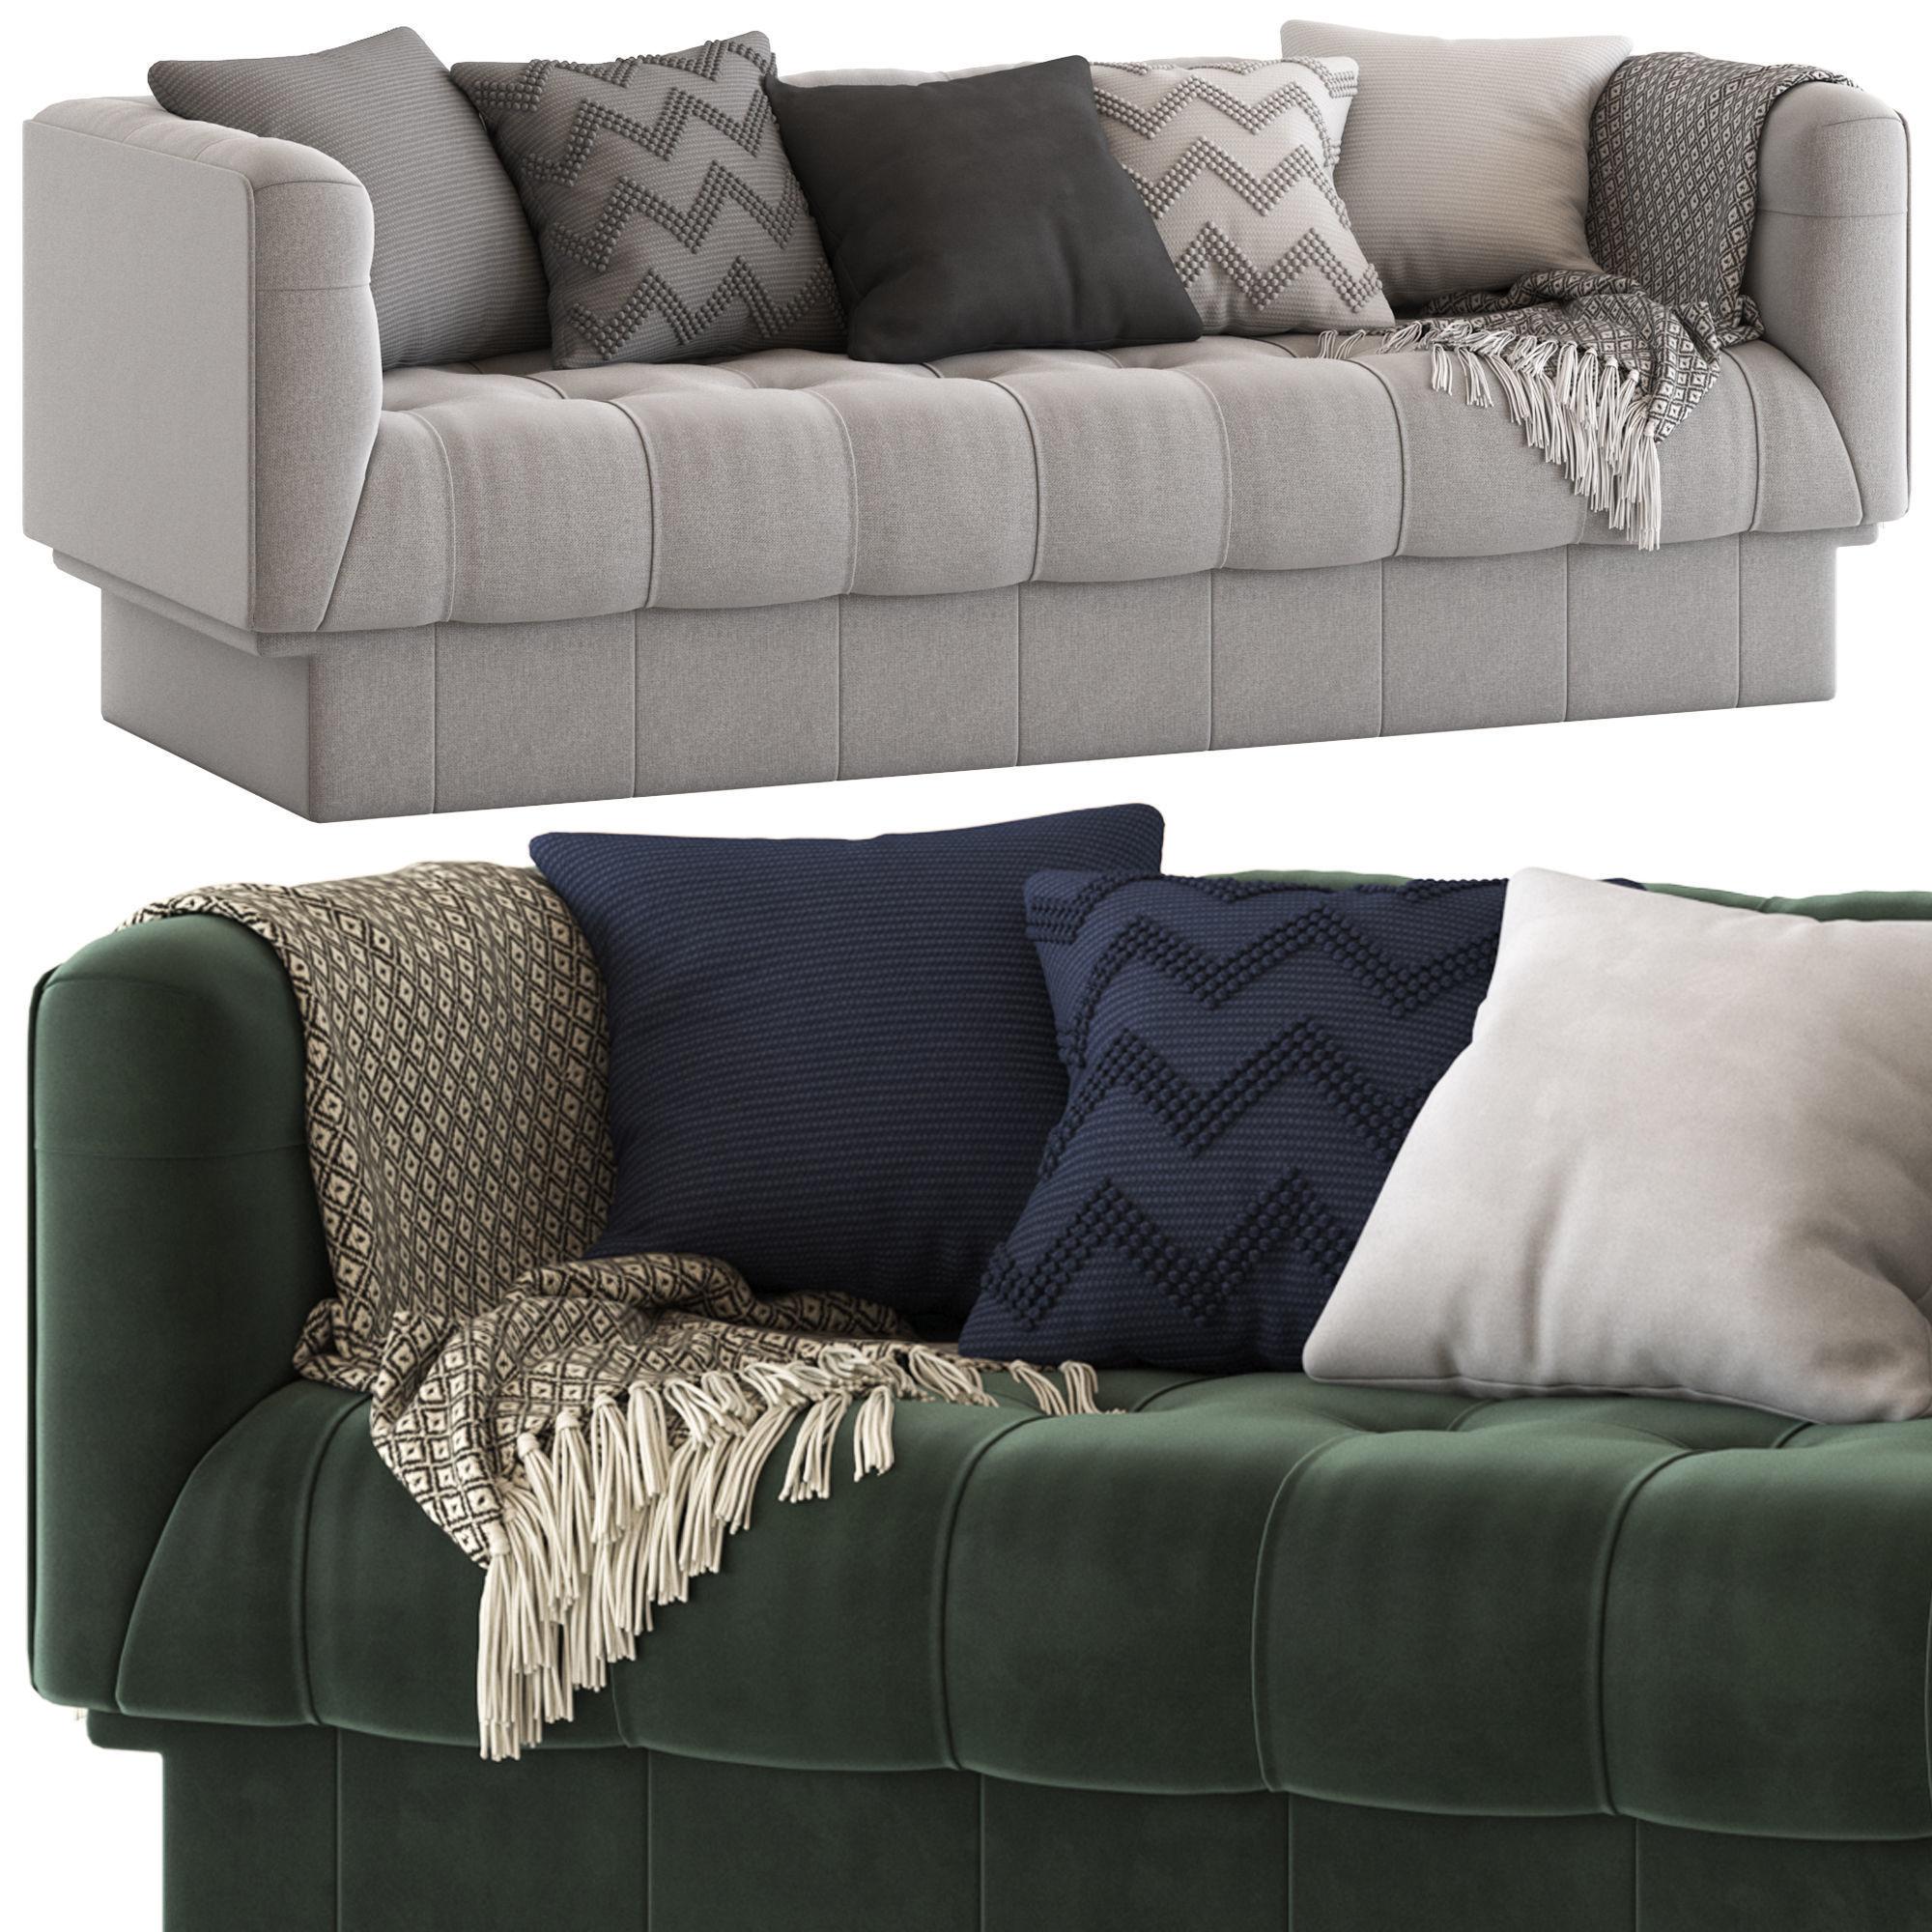 Globewest Humphrey Square 3 Seater Sofa